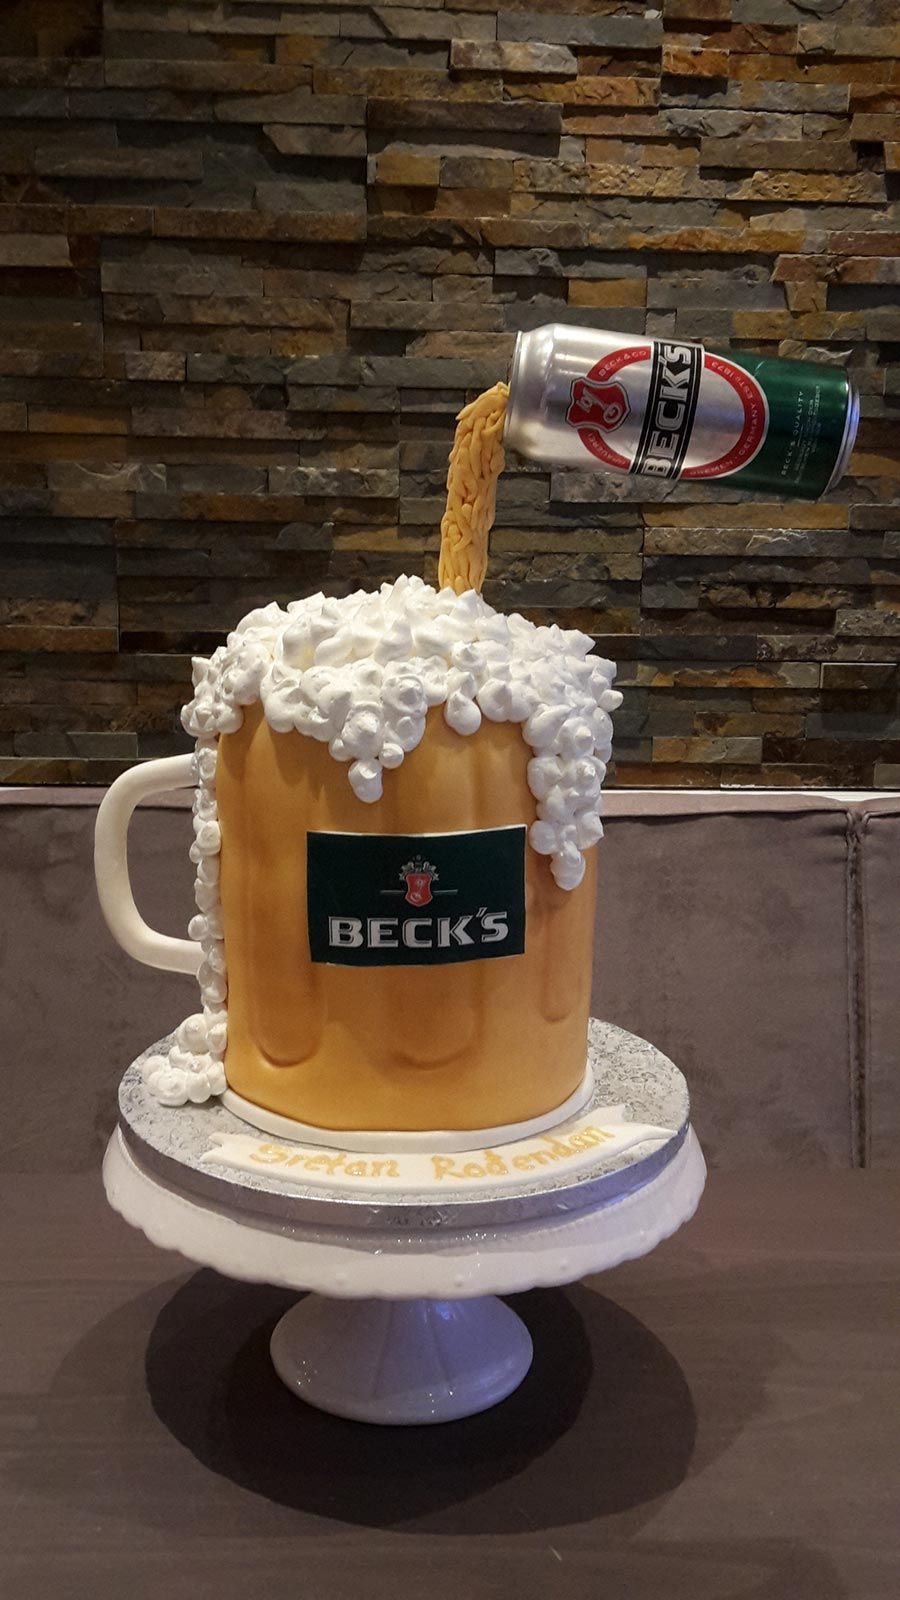 Geburtstagstorte birthdaycake bier 3Dtorte beer